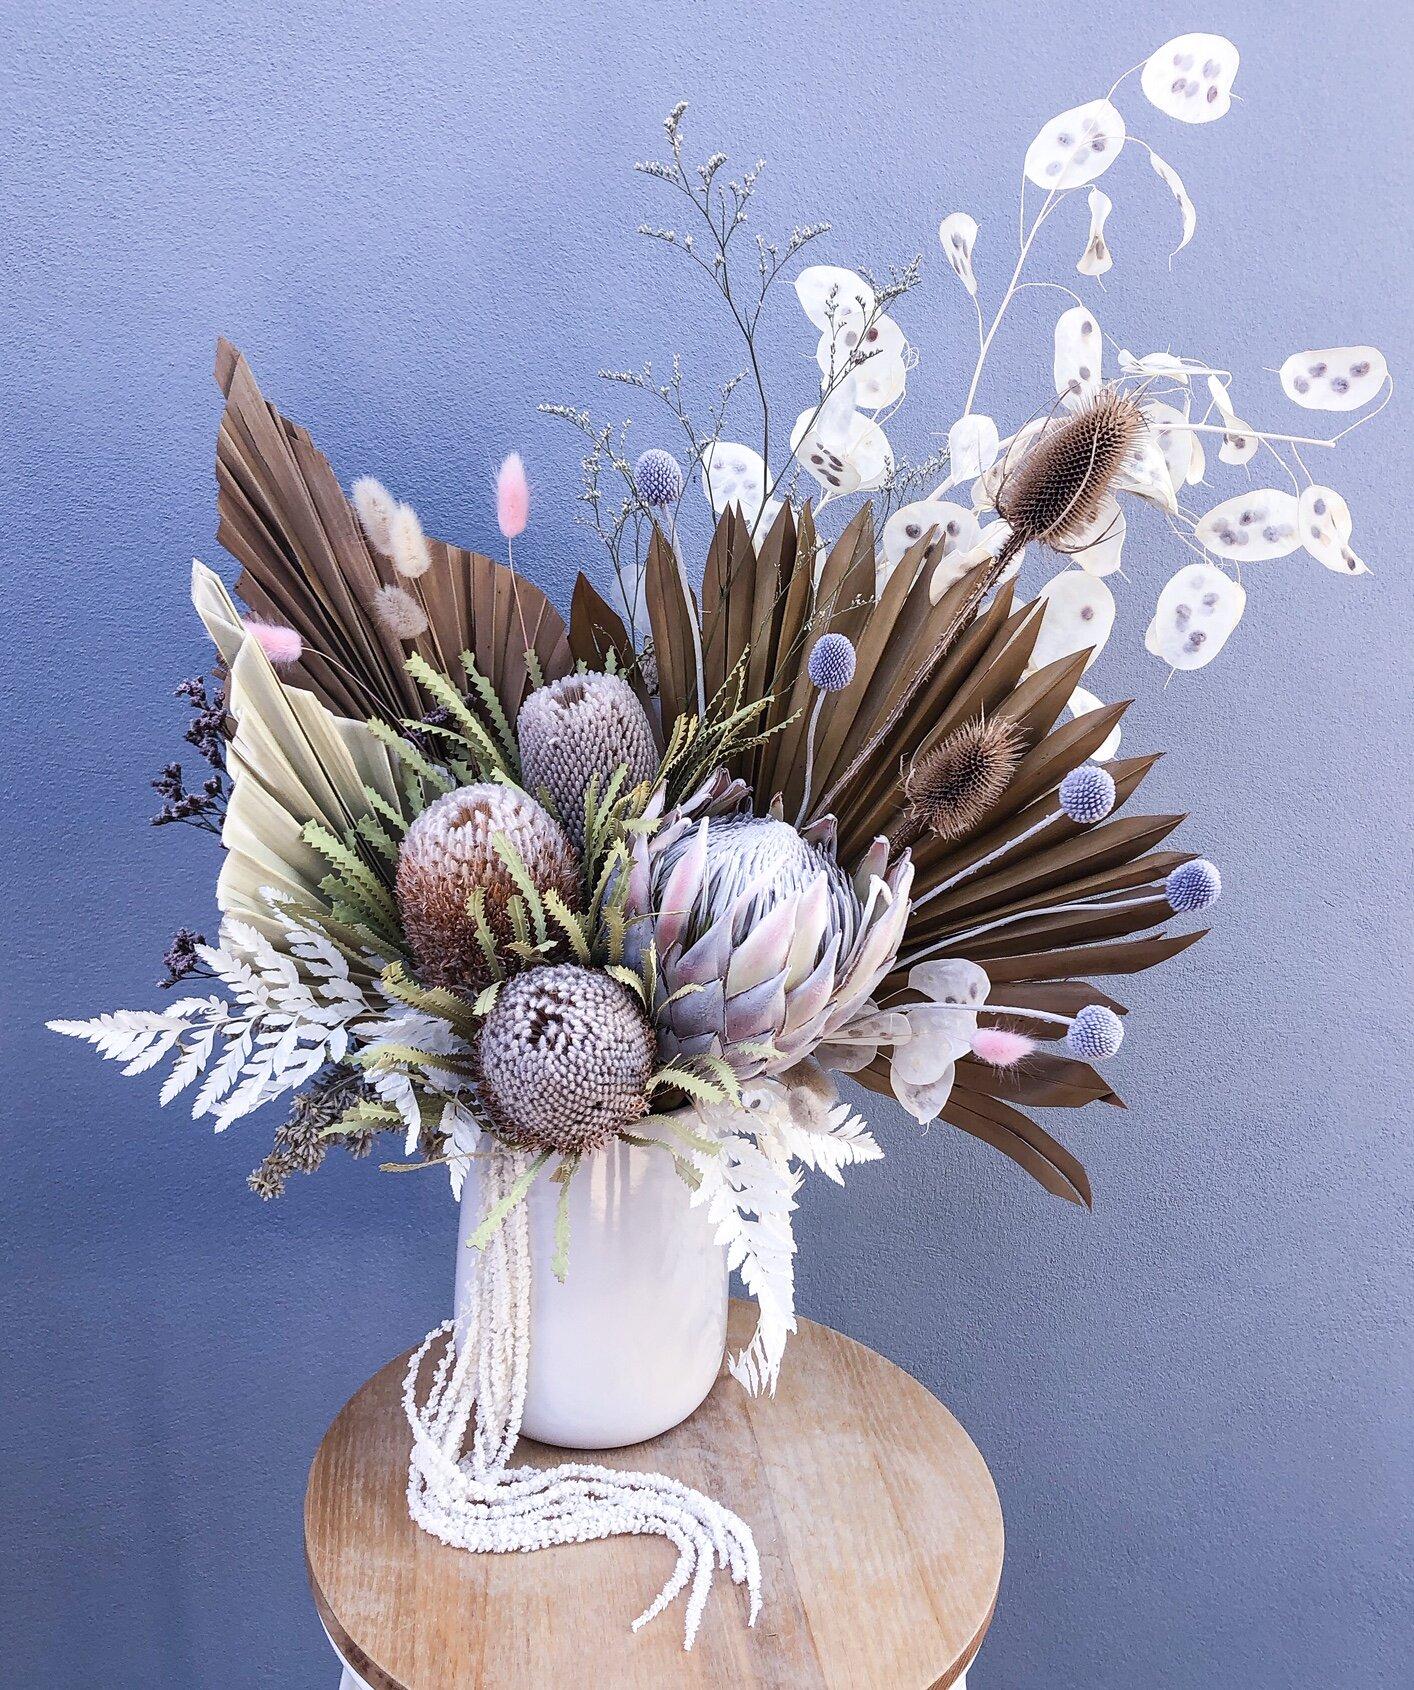 Everlasting Vase Arrangements Lauren Alyce Floral Design